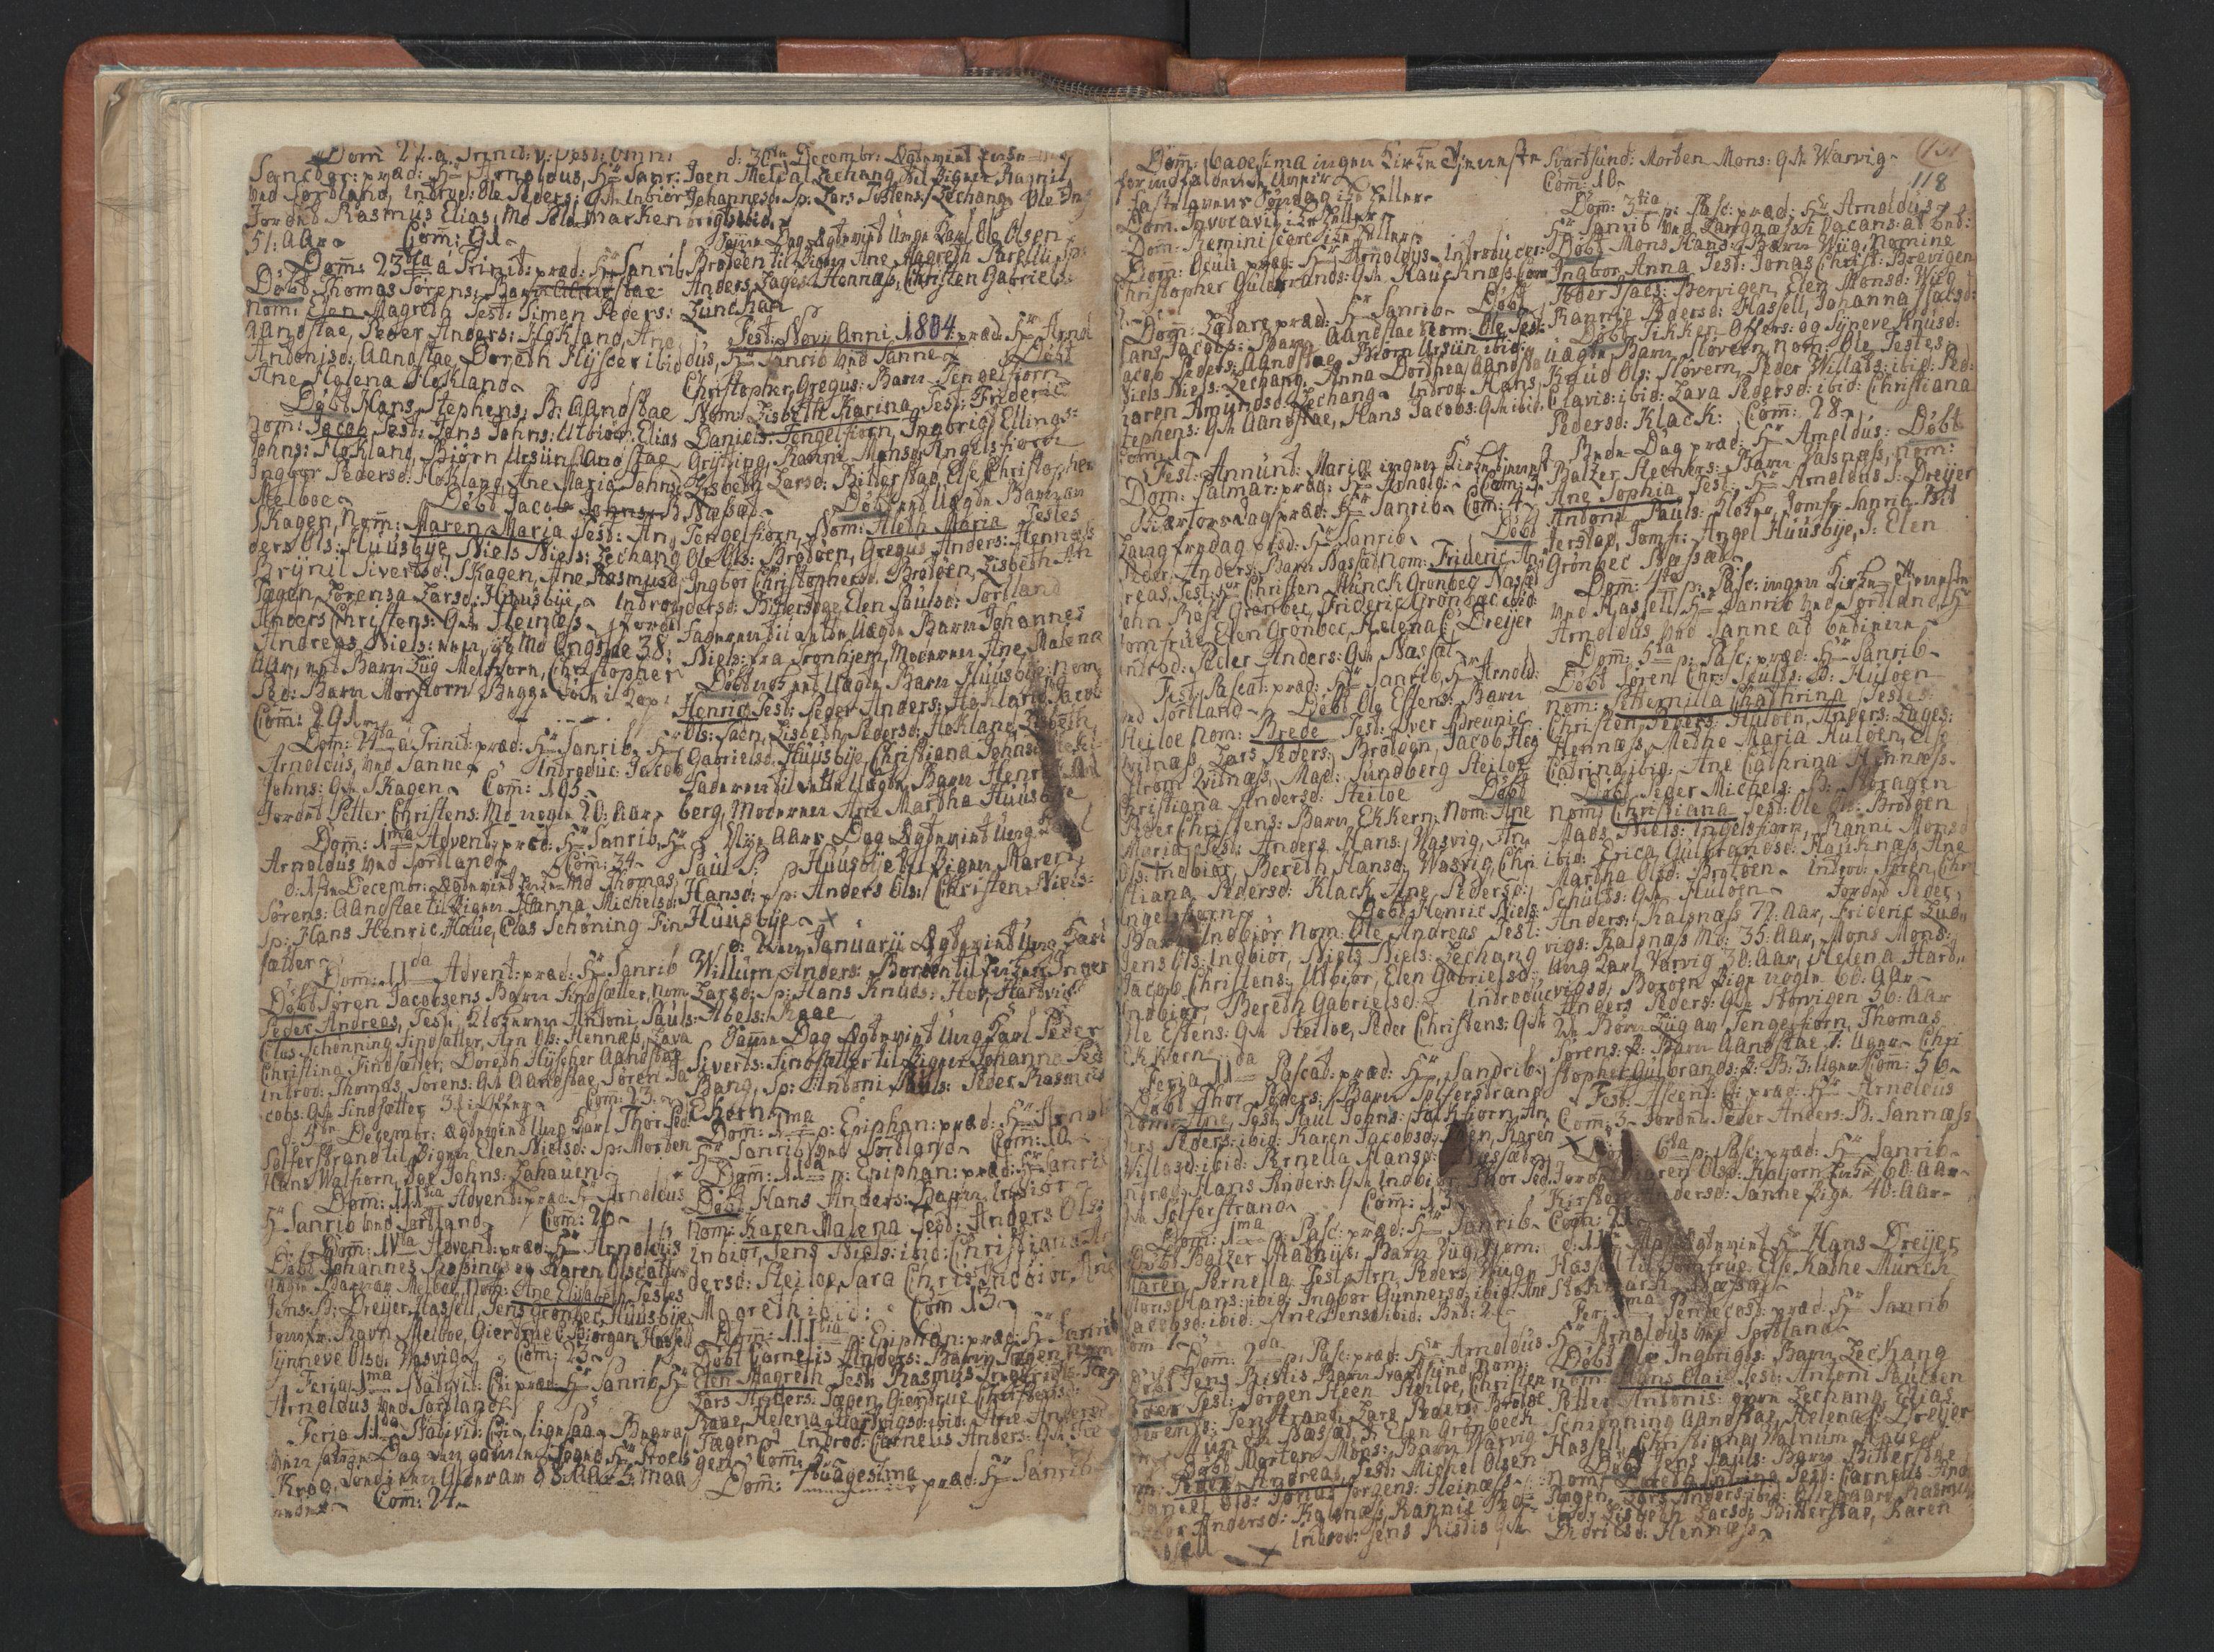 SAT, Ministerialprotokoller, klokkerbøker og fødselsregistre - Nordland, 888/L1233: Ministerialbok nr. 888A02, 1754-1811, s. 131